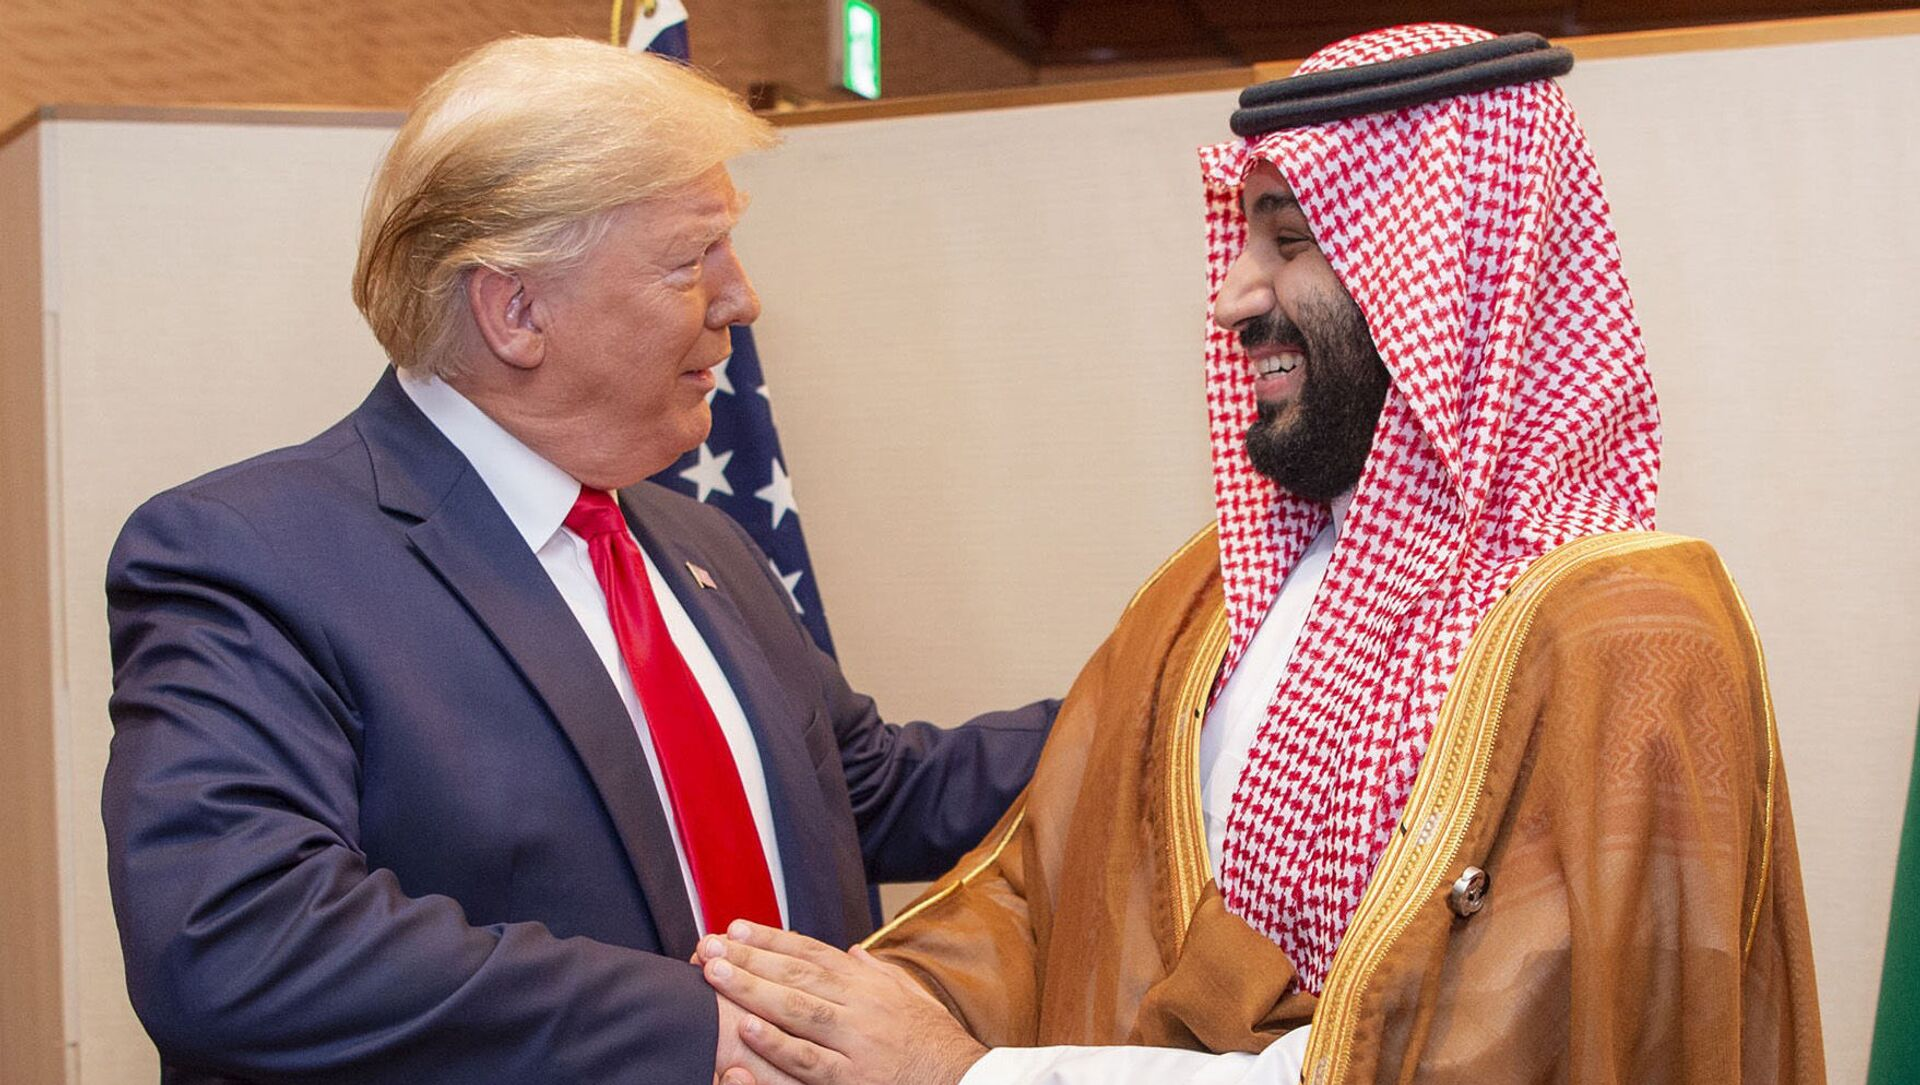 El presidente de EEUU, Donald Trump junto al príncipe heredero de Arabia Saudí, Mohammed bin Salman  - Sputnik Mundo, 1920, 10.09.2020